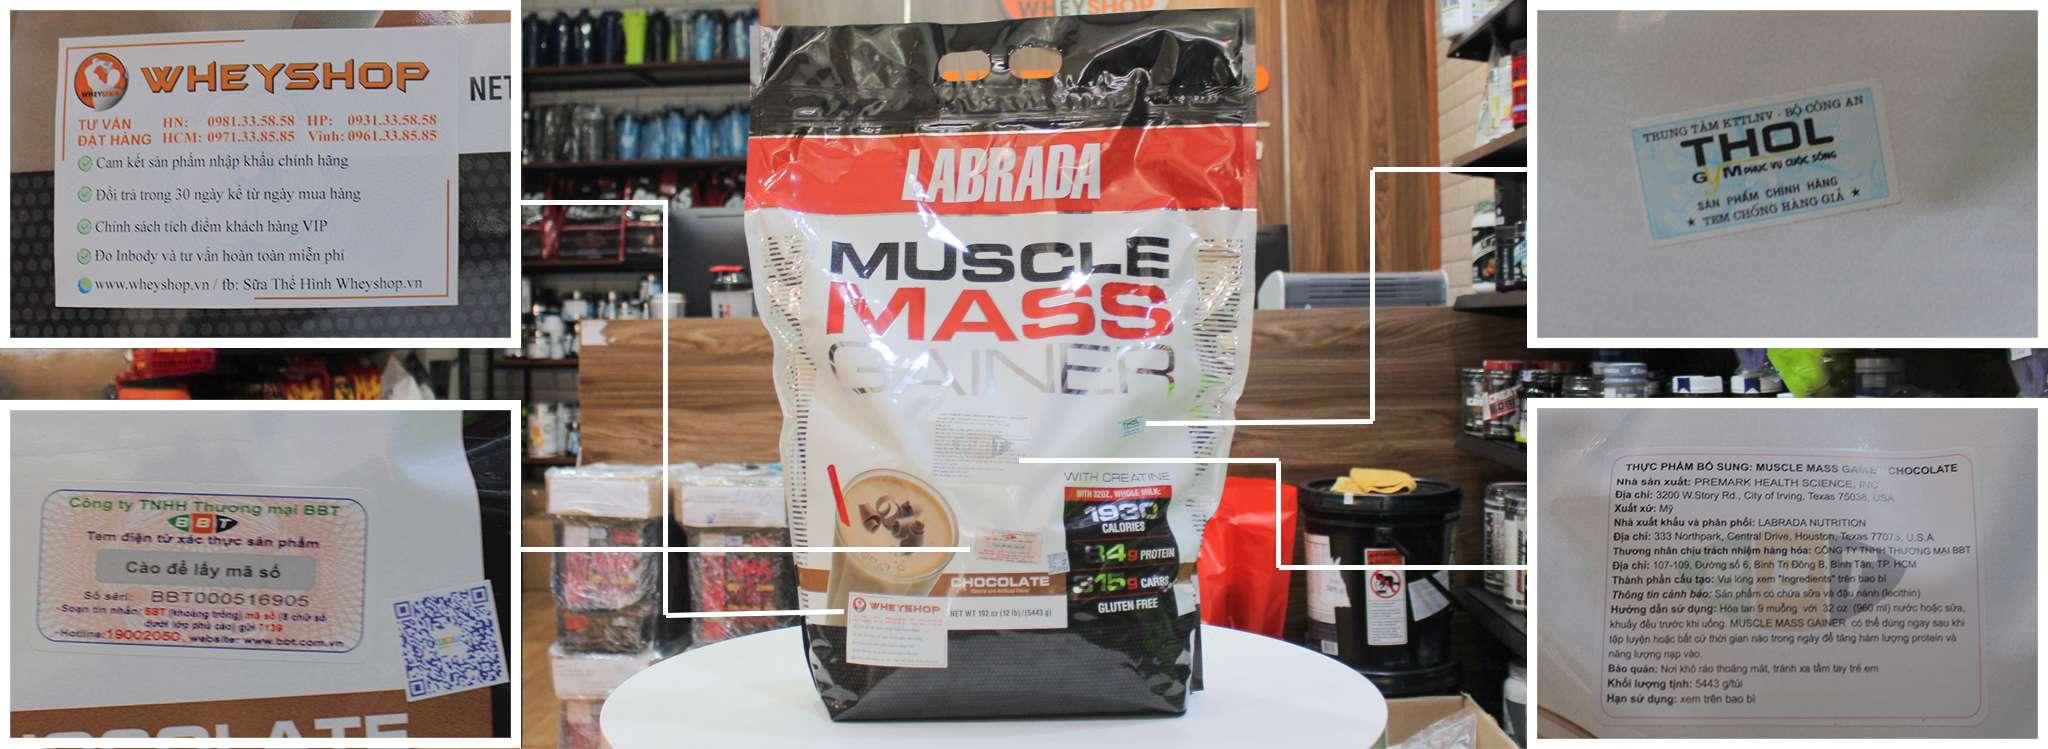 muscle mass 5,4 kg gia re ha noi tphcm